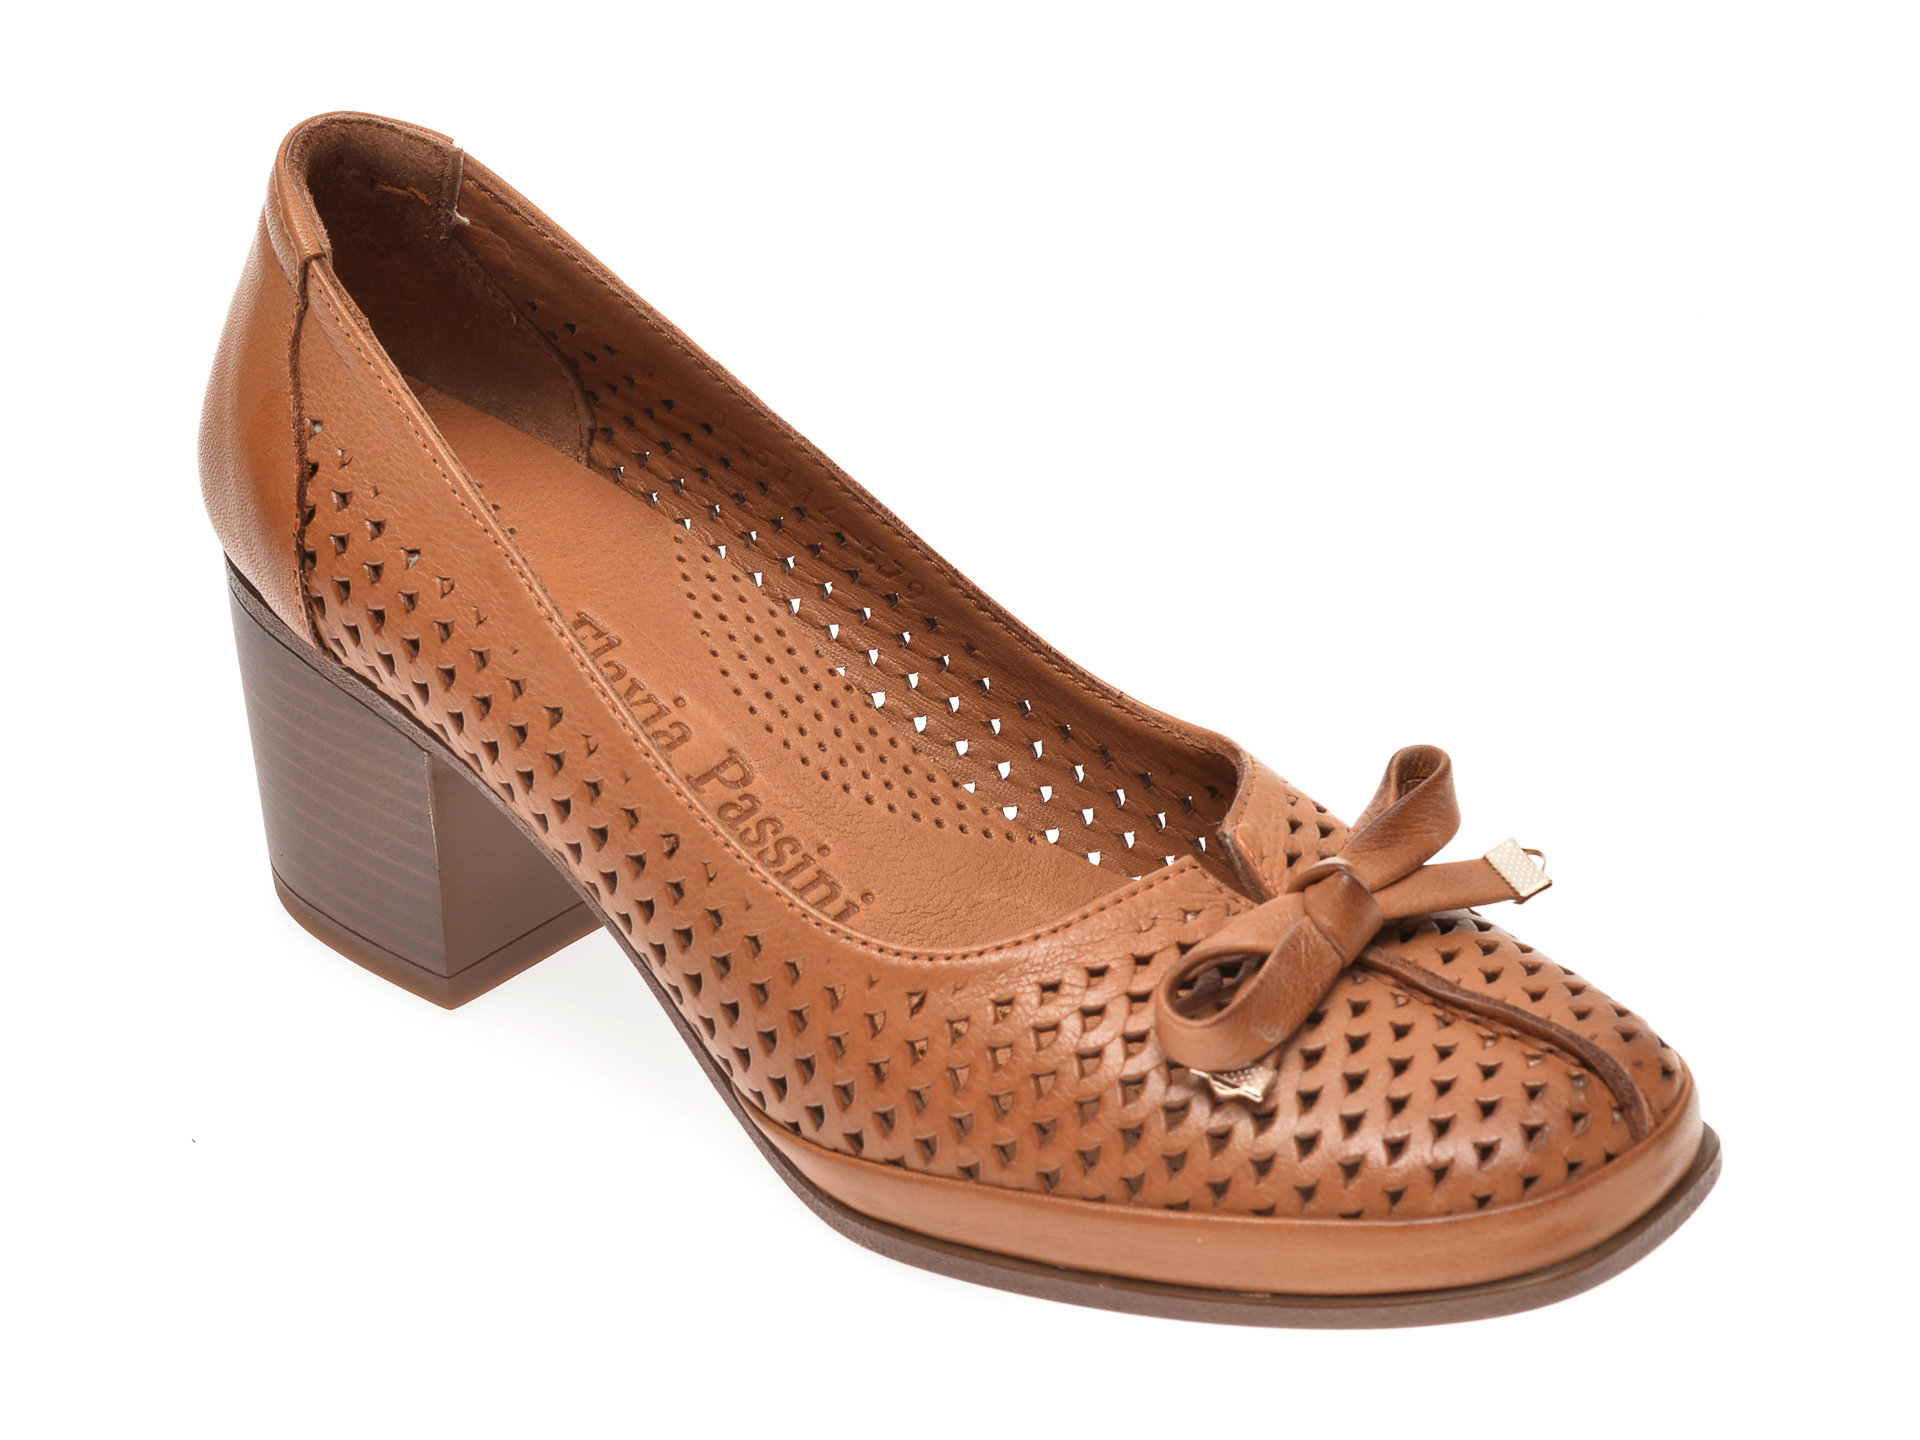 Pantofi FLAVIA PASSINI coniac, 0105114, din piele naturala